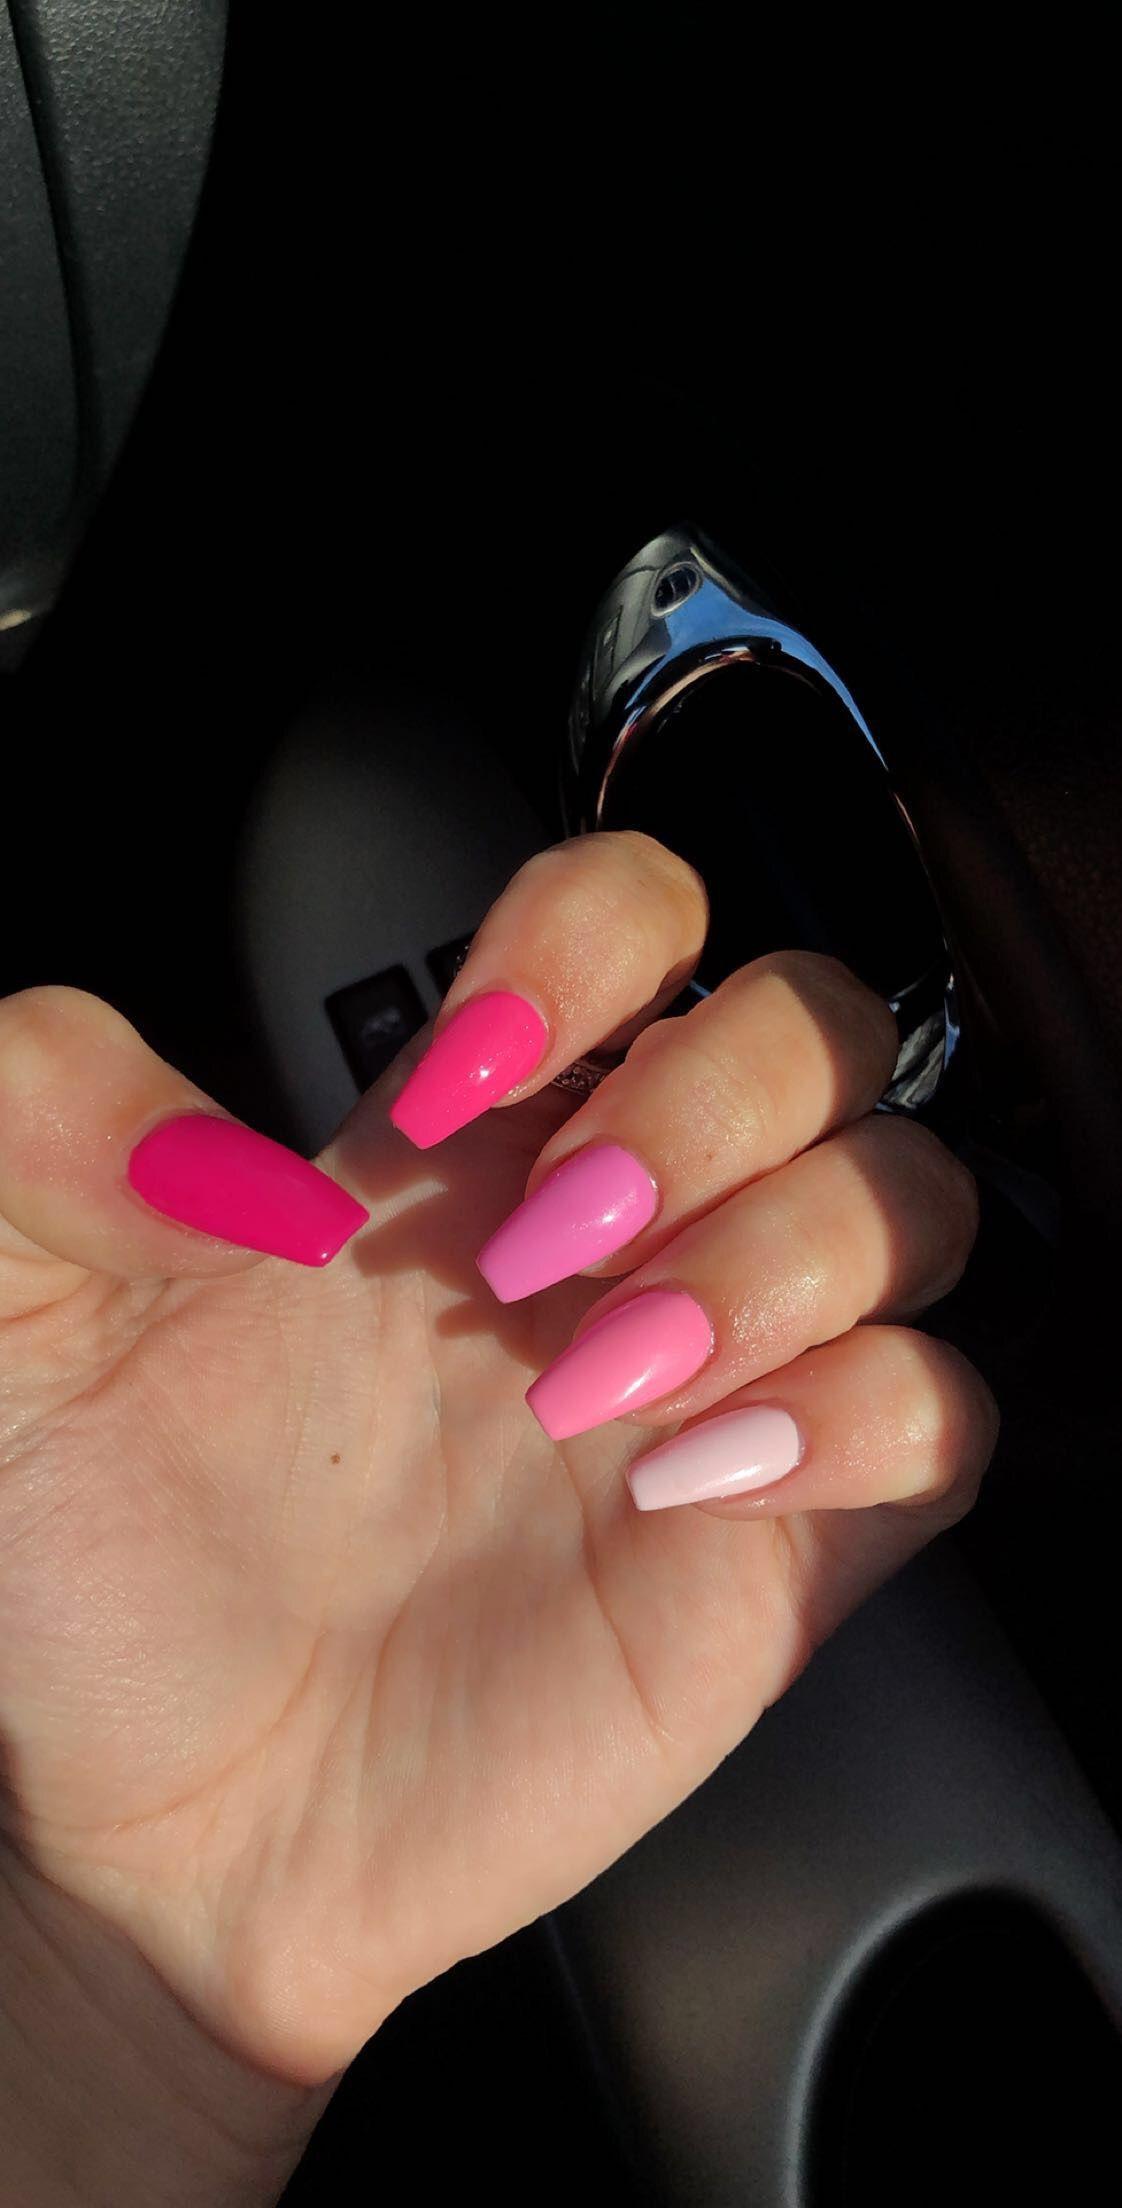 Pink Acrylic Nails Inspo Light Pink Acrylic Nails Pink Acrylic Nails Bright Pink Nails